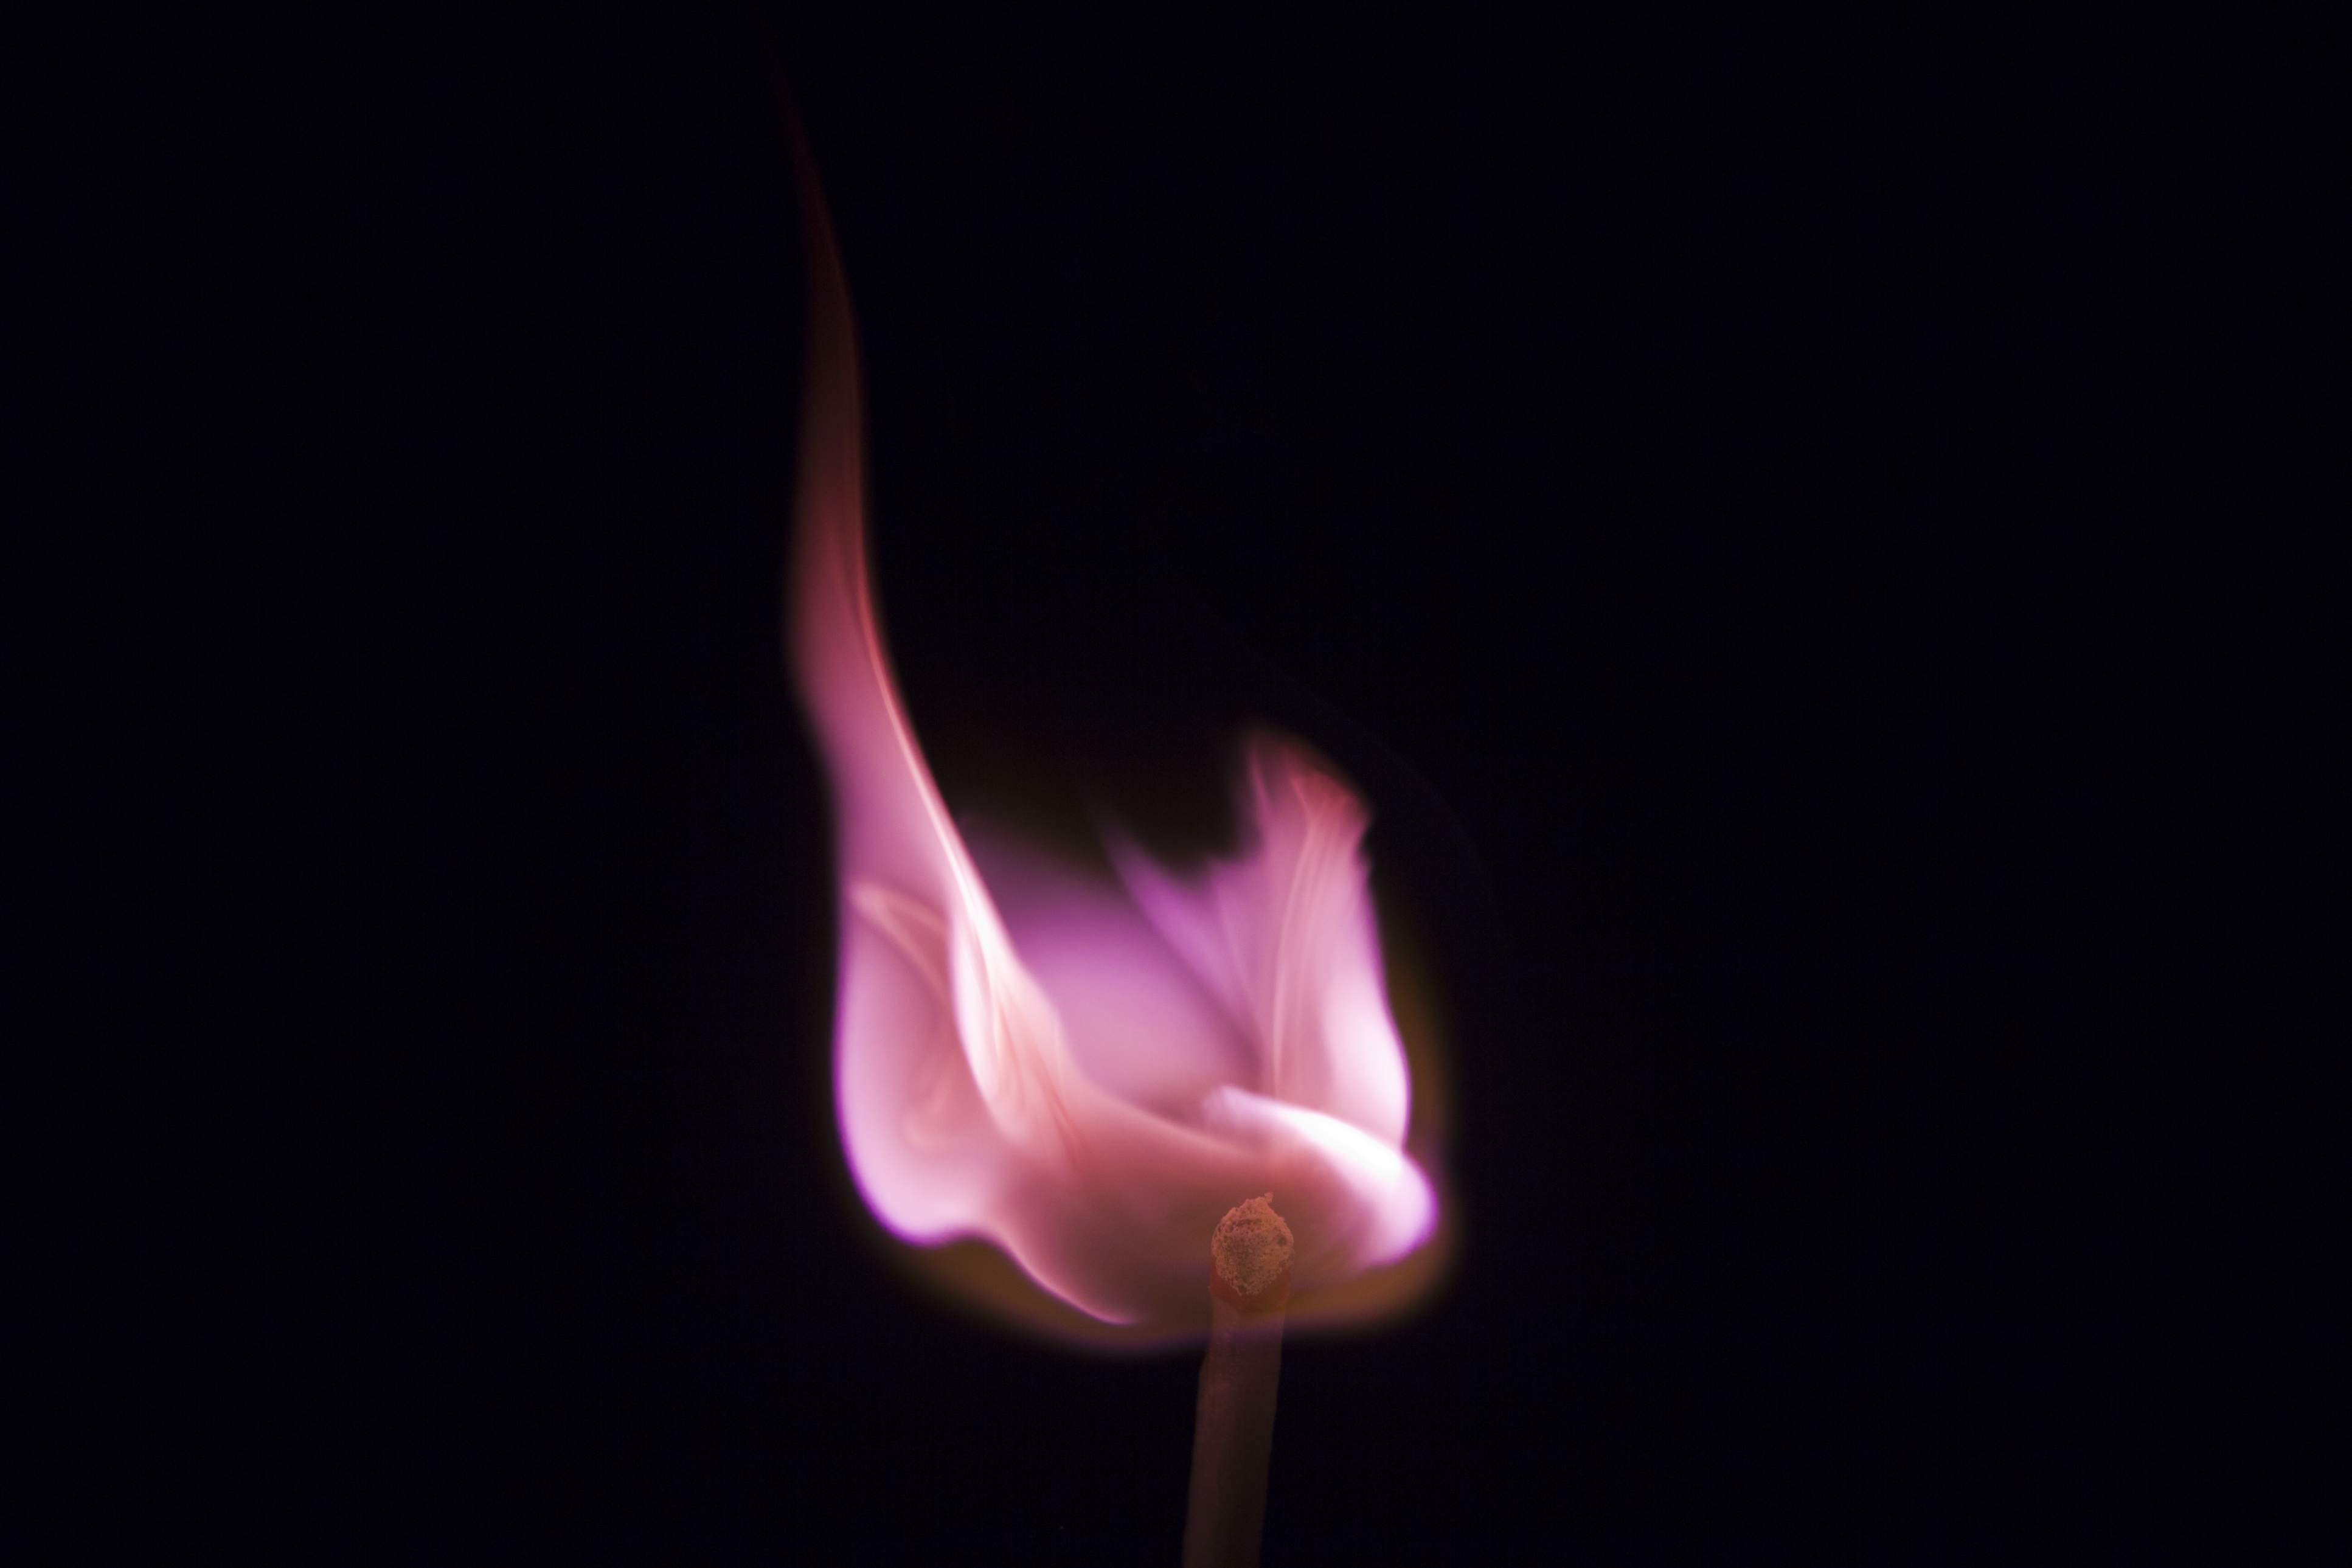 Lithium salts turn a flame hot pink to magenta